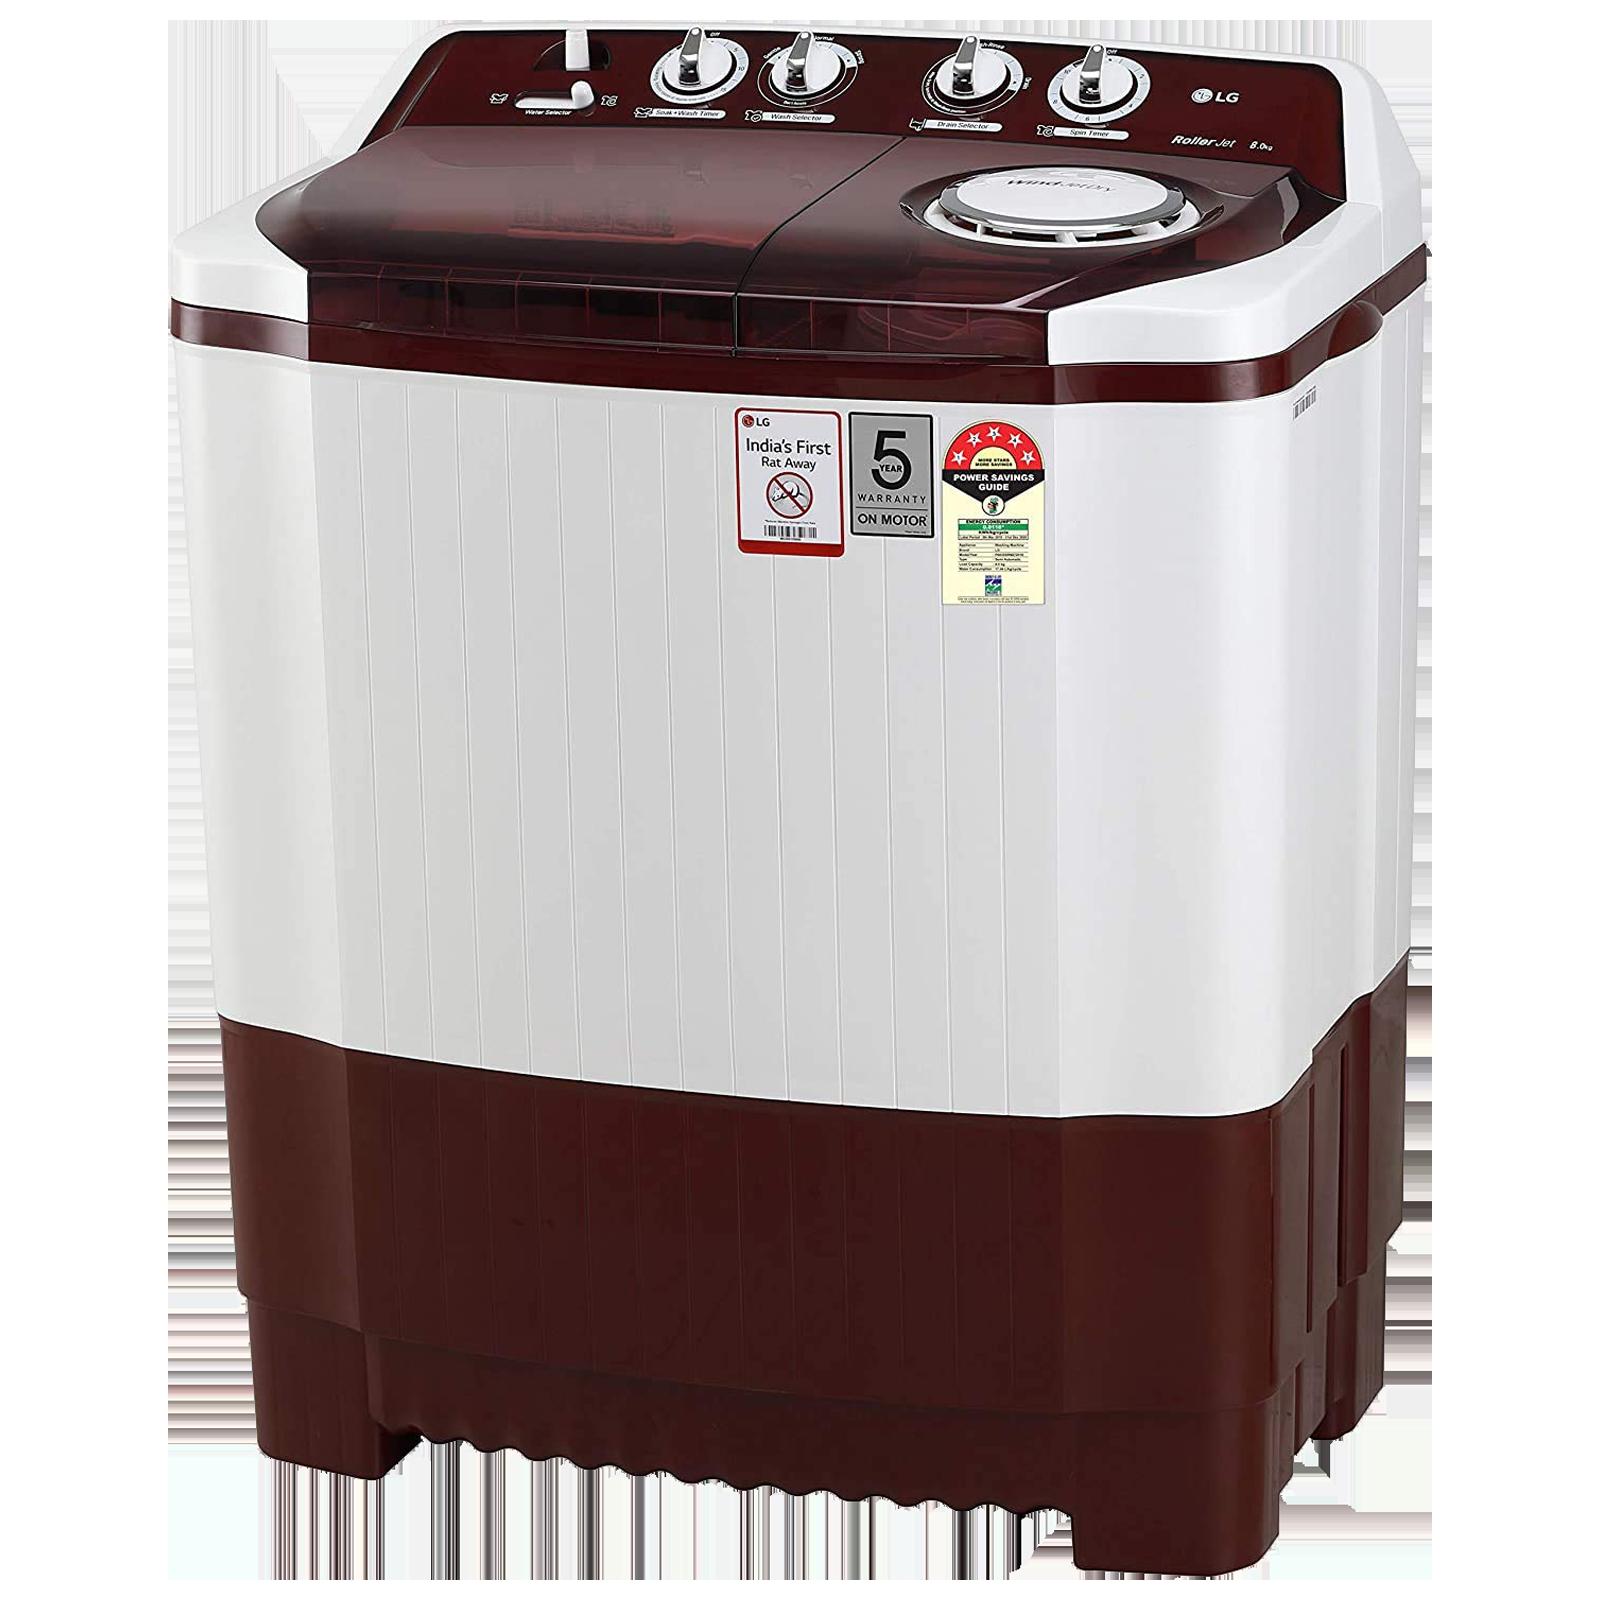 LG 8 kg 5 Star Semi-Automatic Top Load Washing Machine (Auto Restart, P8035SRMZ.ABGQEIL, Burgundy)_3